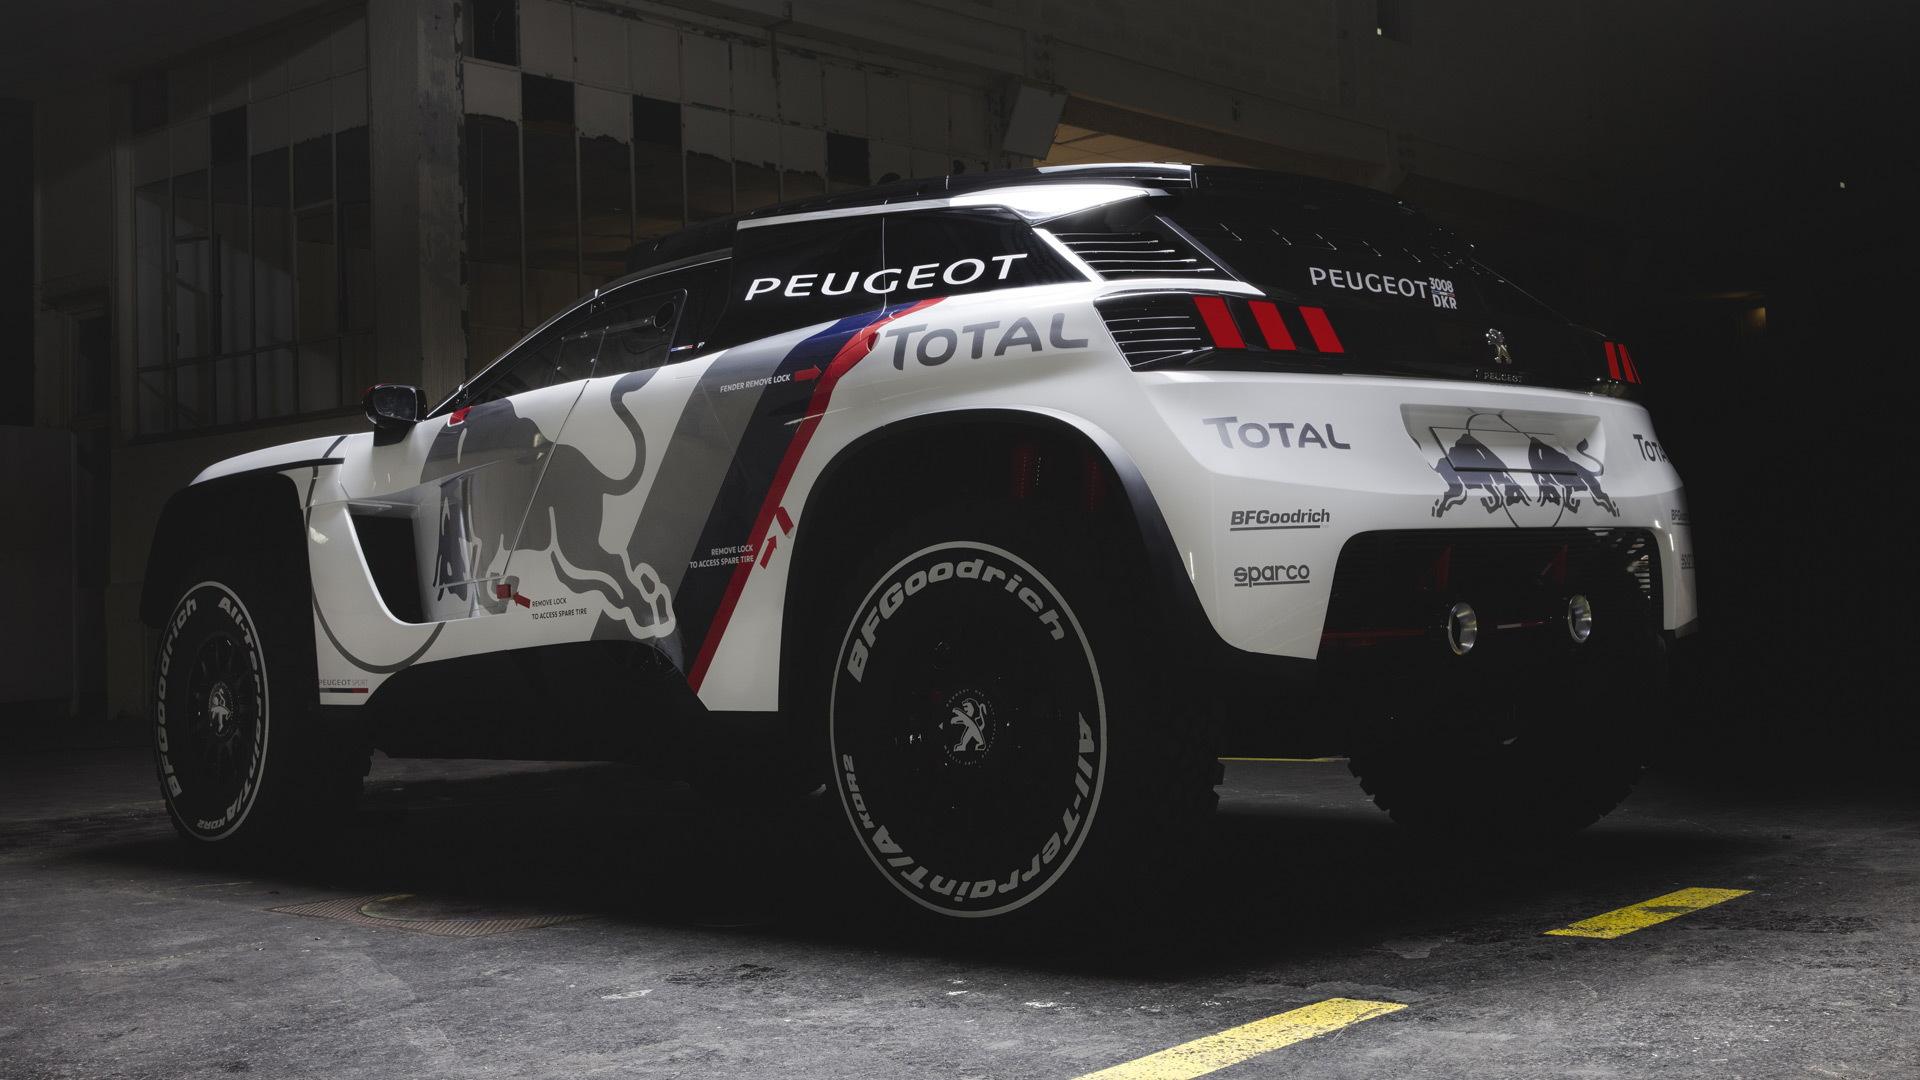 2017 Peugeot 3008 DKR